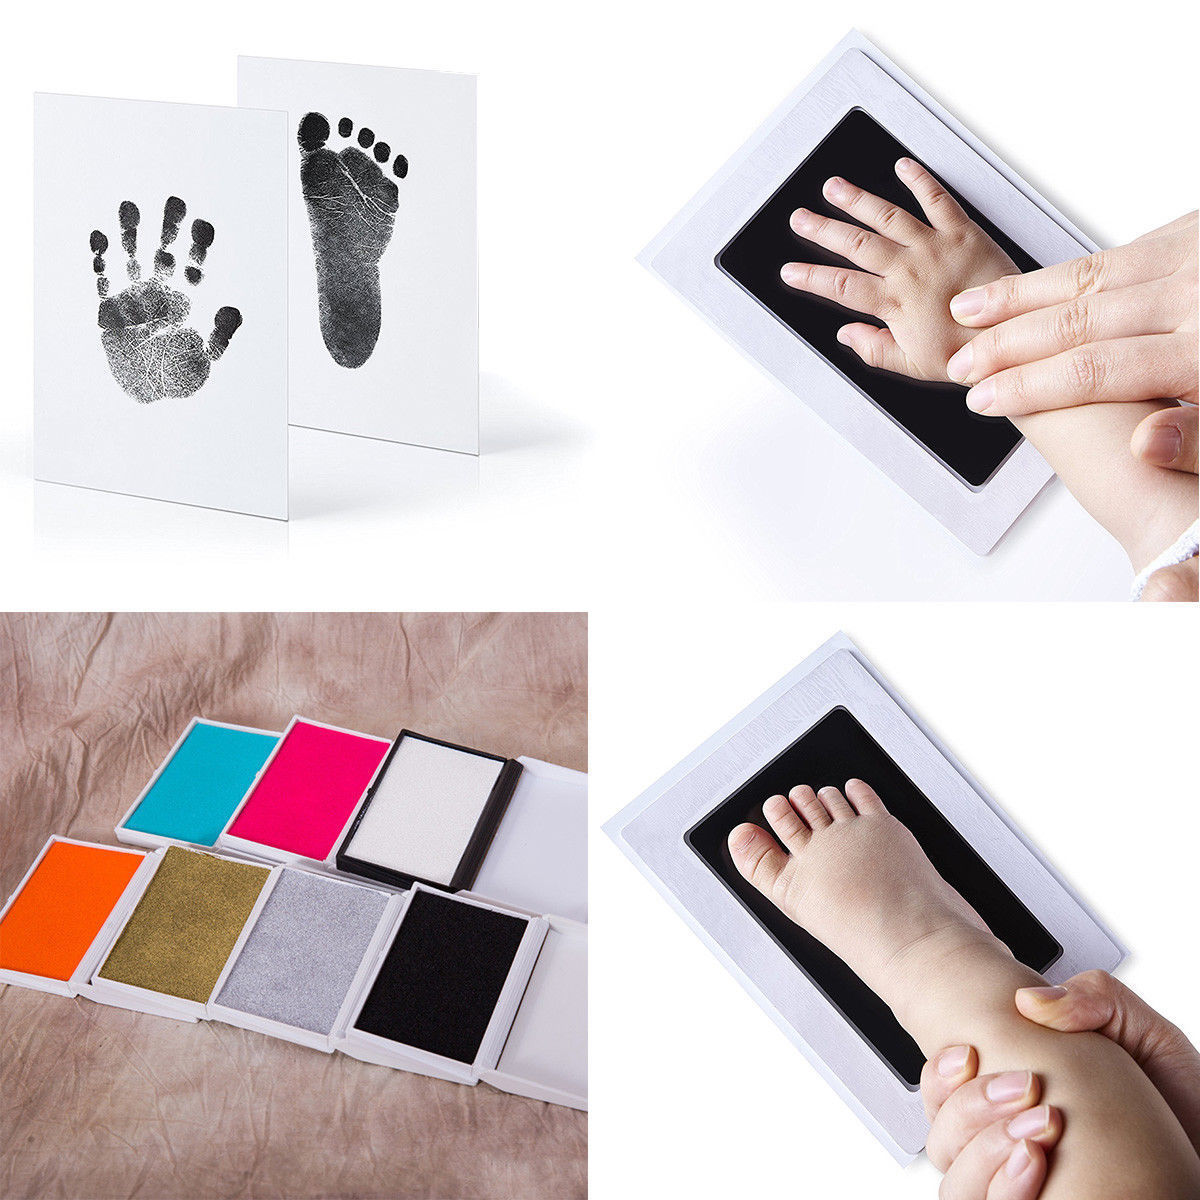 QUALITY Inkless Print Wipe Kit NewBorn Safe Baby Hand /& Foot Print Keepsake Baby